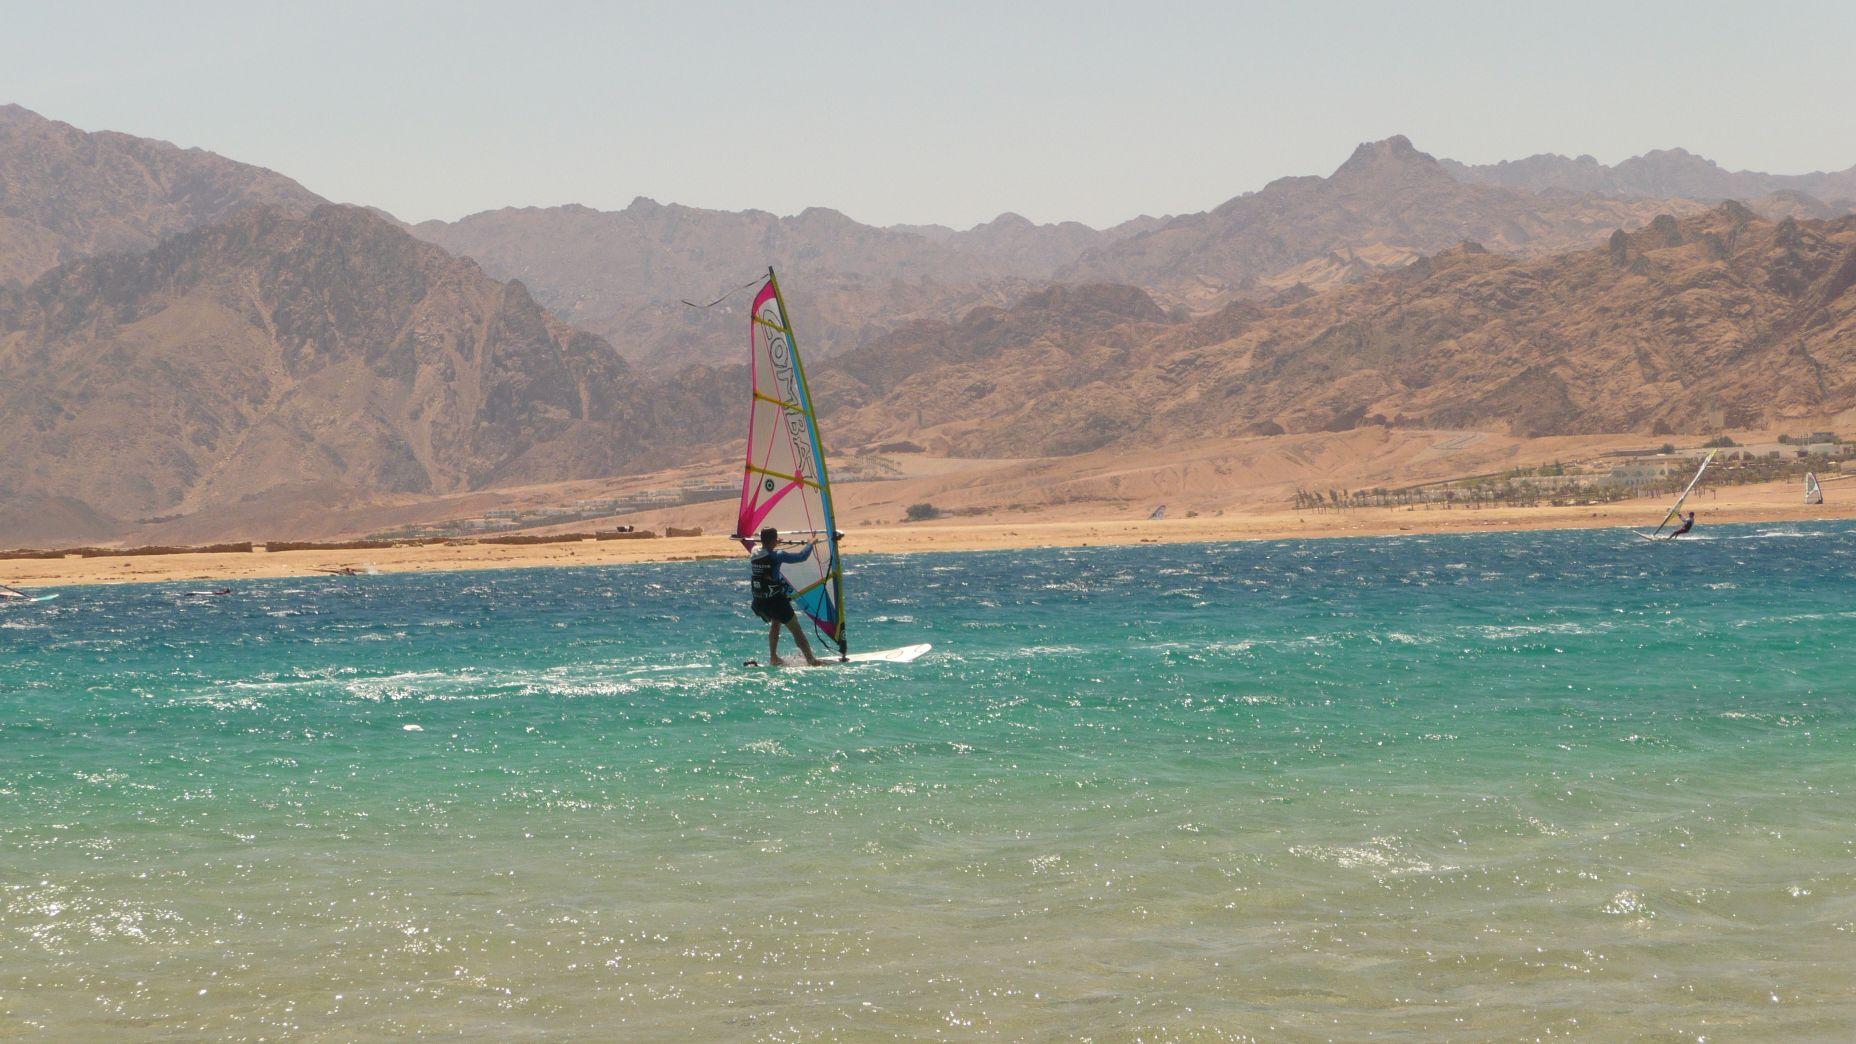 Egipt - Dahab - windsurfing kitesurfing